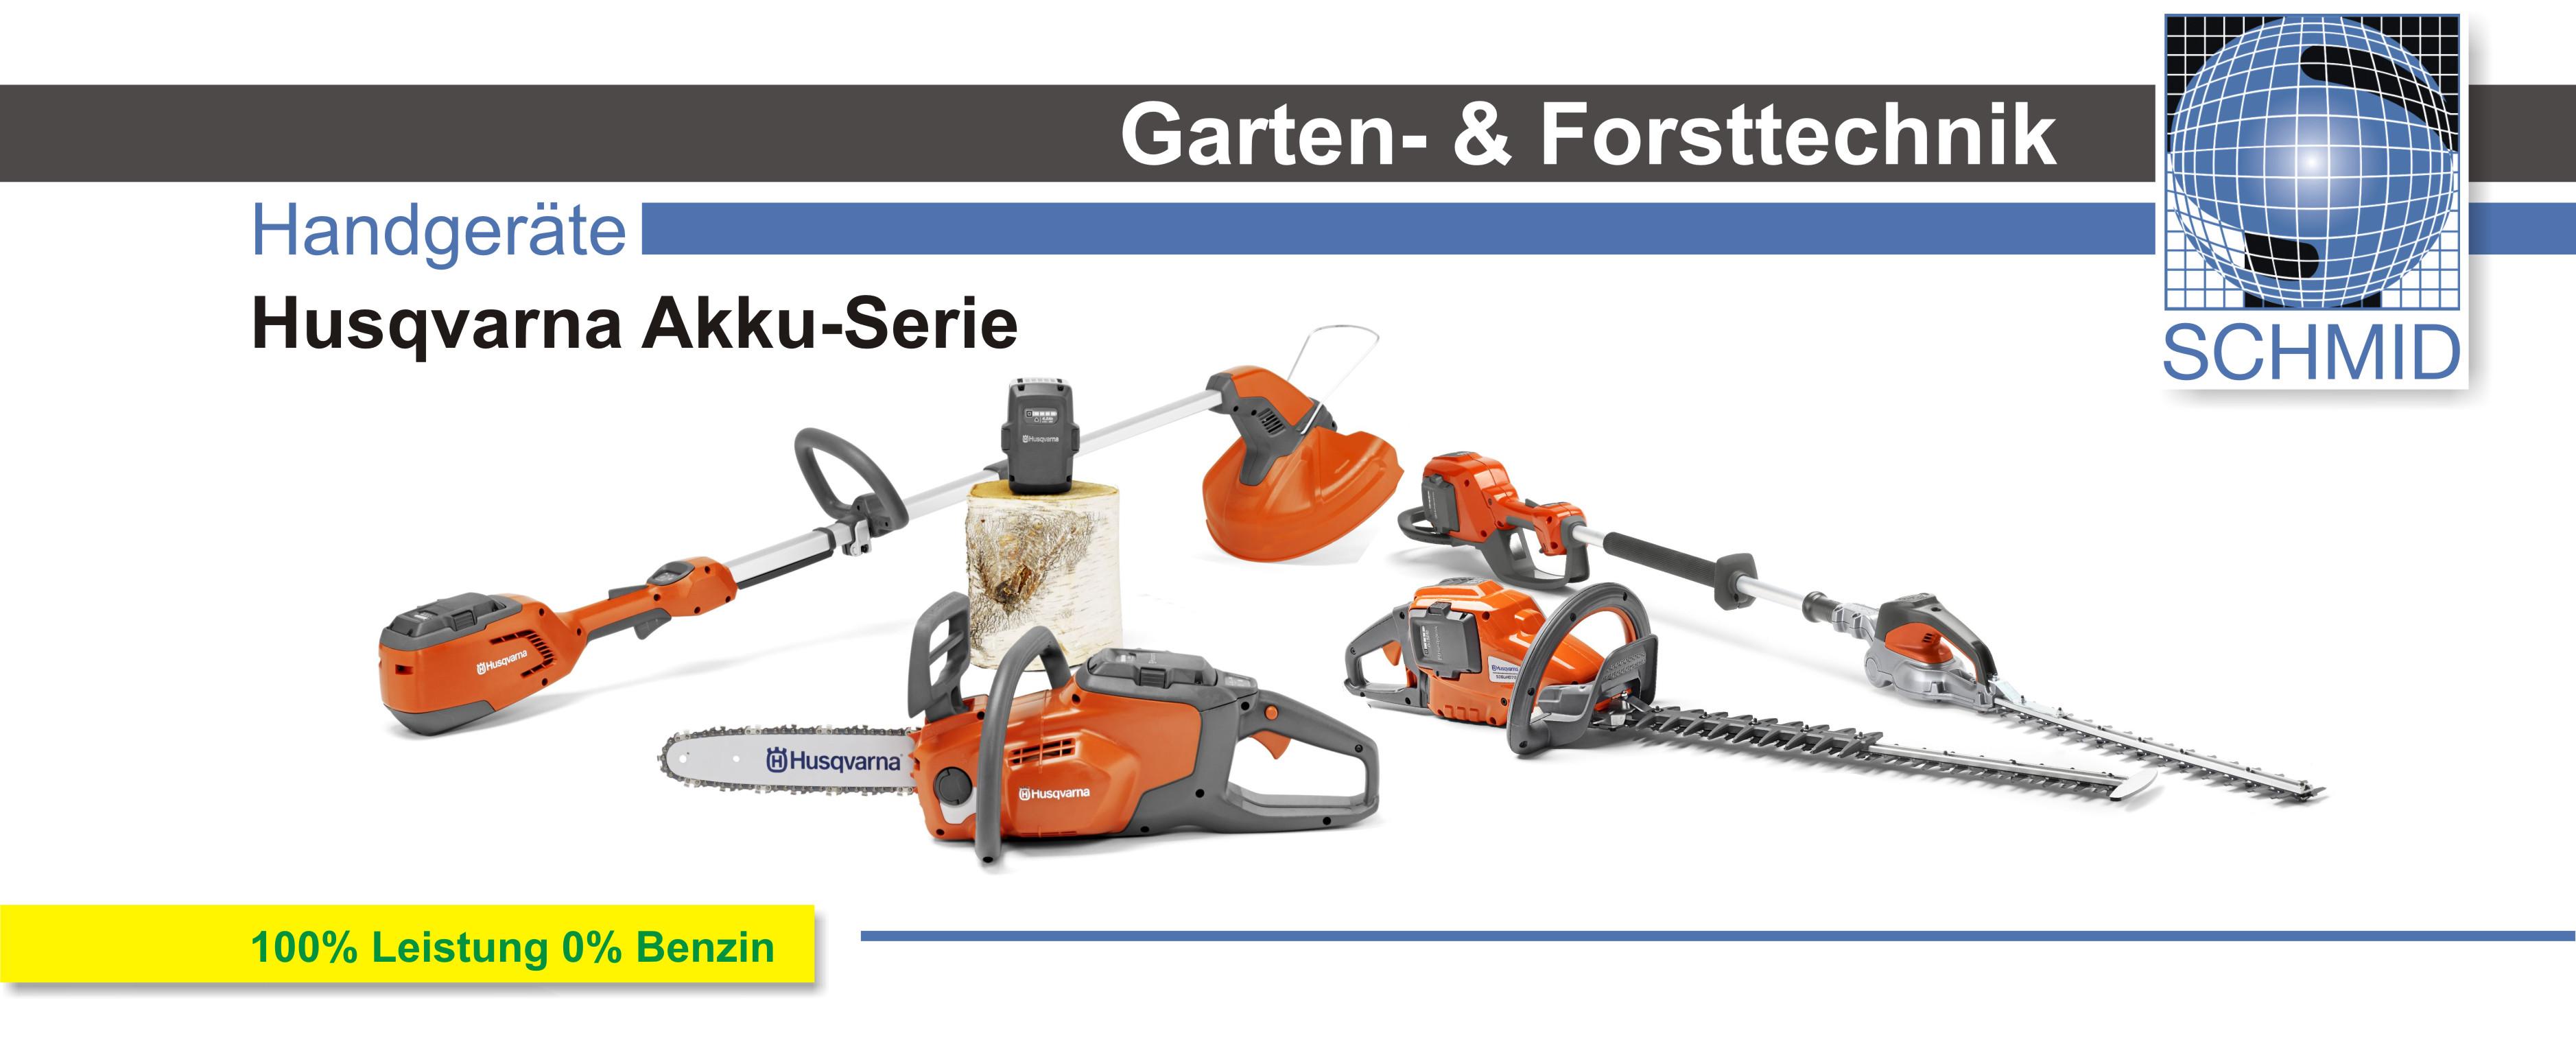 Schmid Vertriebs GmbH Husqvarna Akku Serie